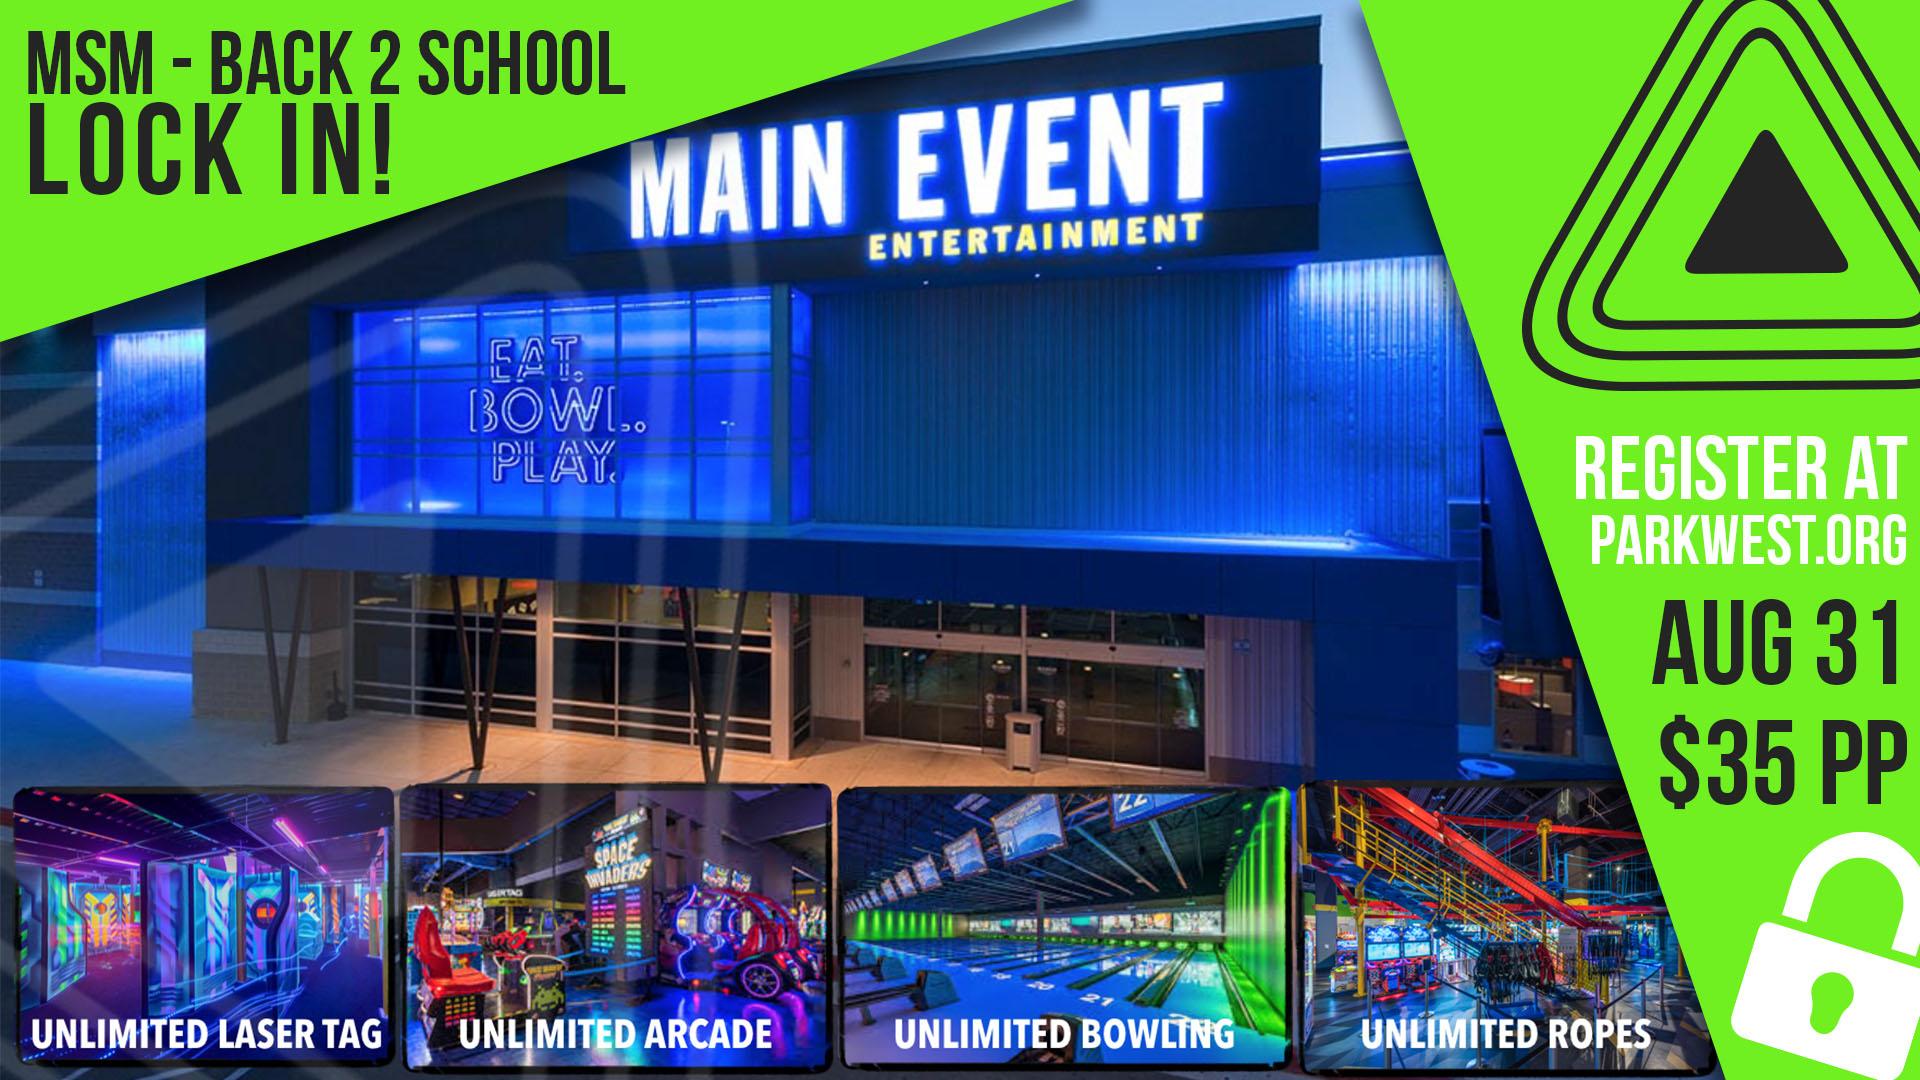 Main event graphic